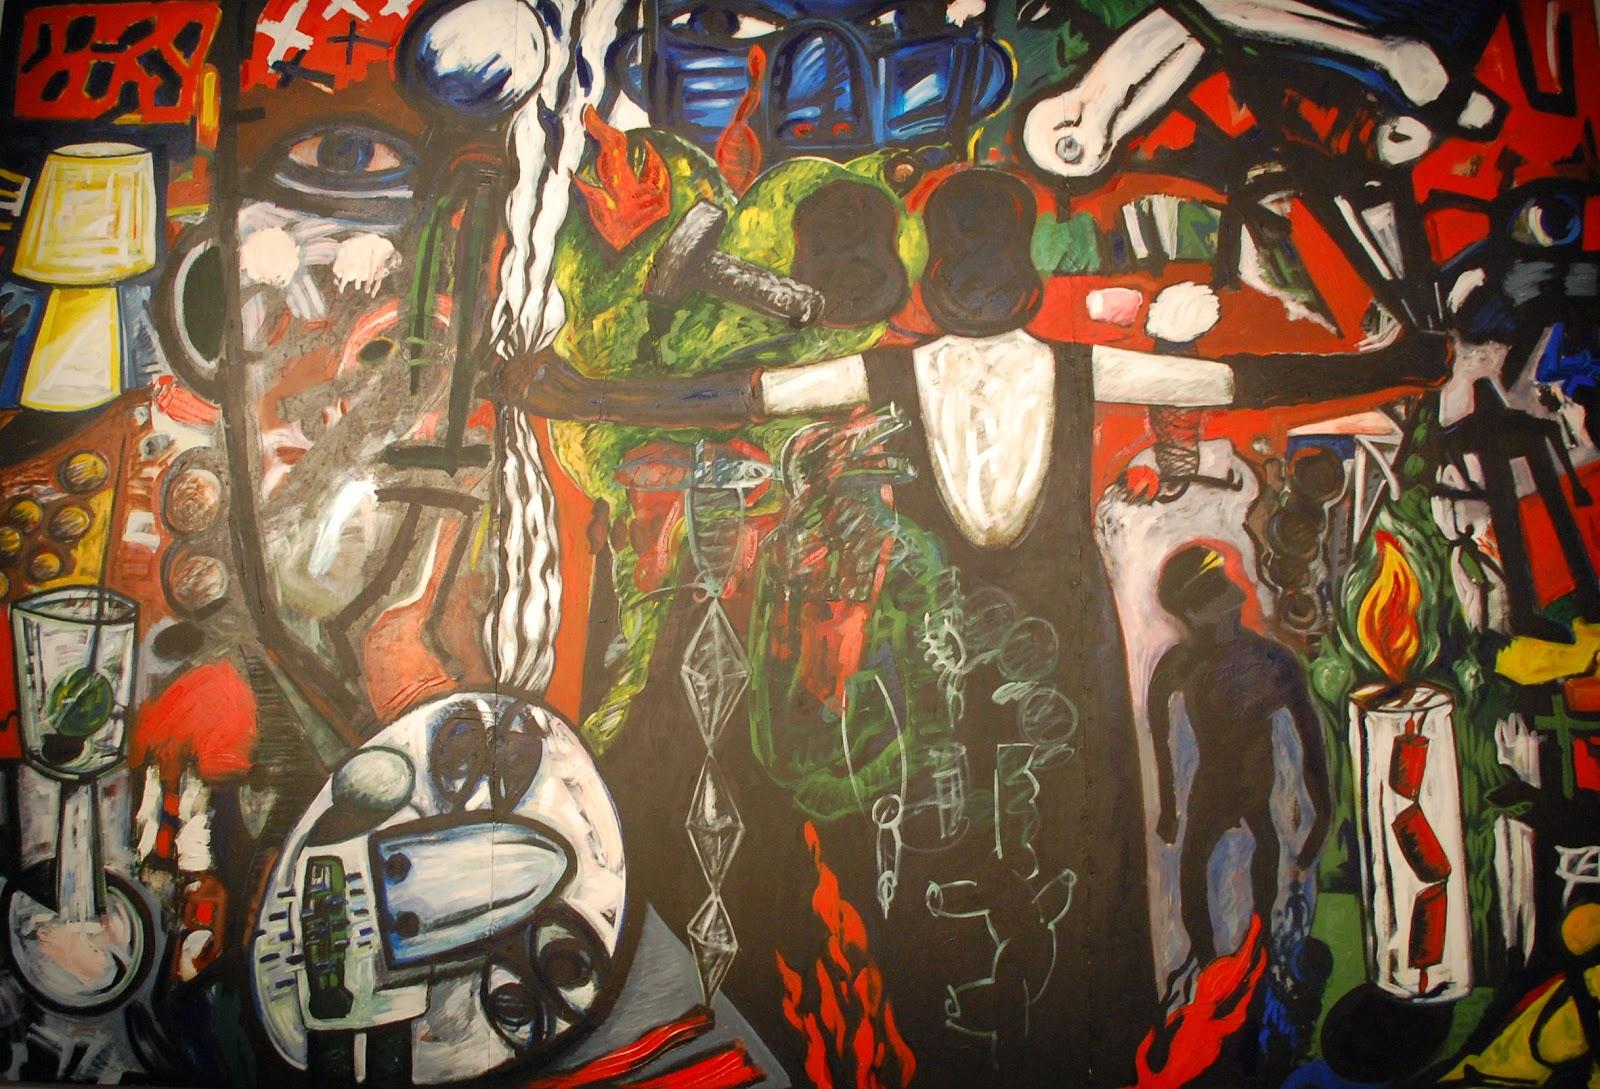 671 La Tormenta Returns by Glugio Nicandro, 1998